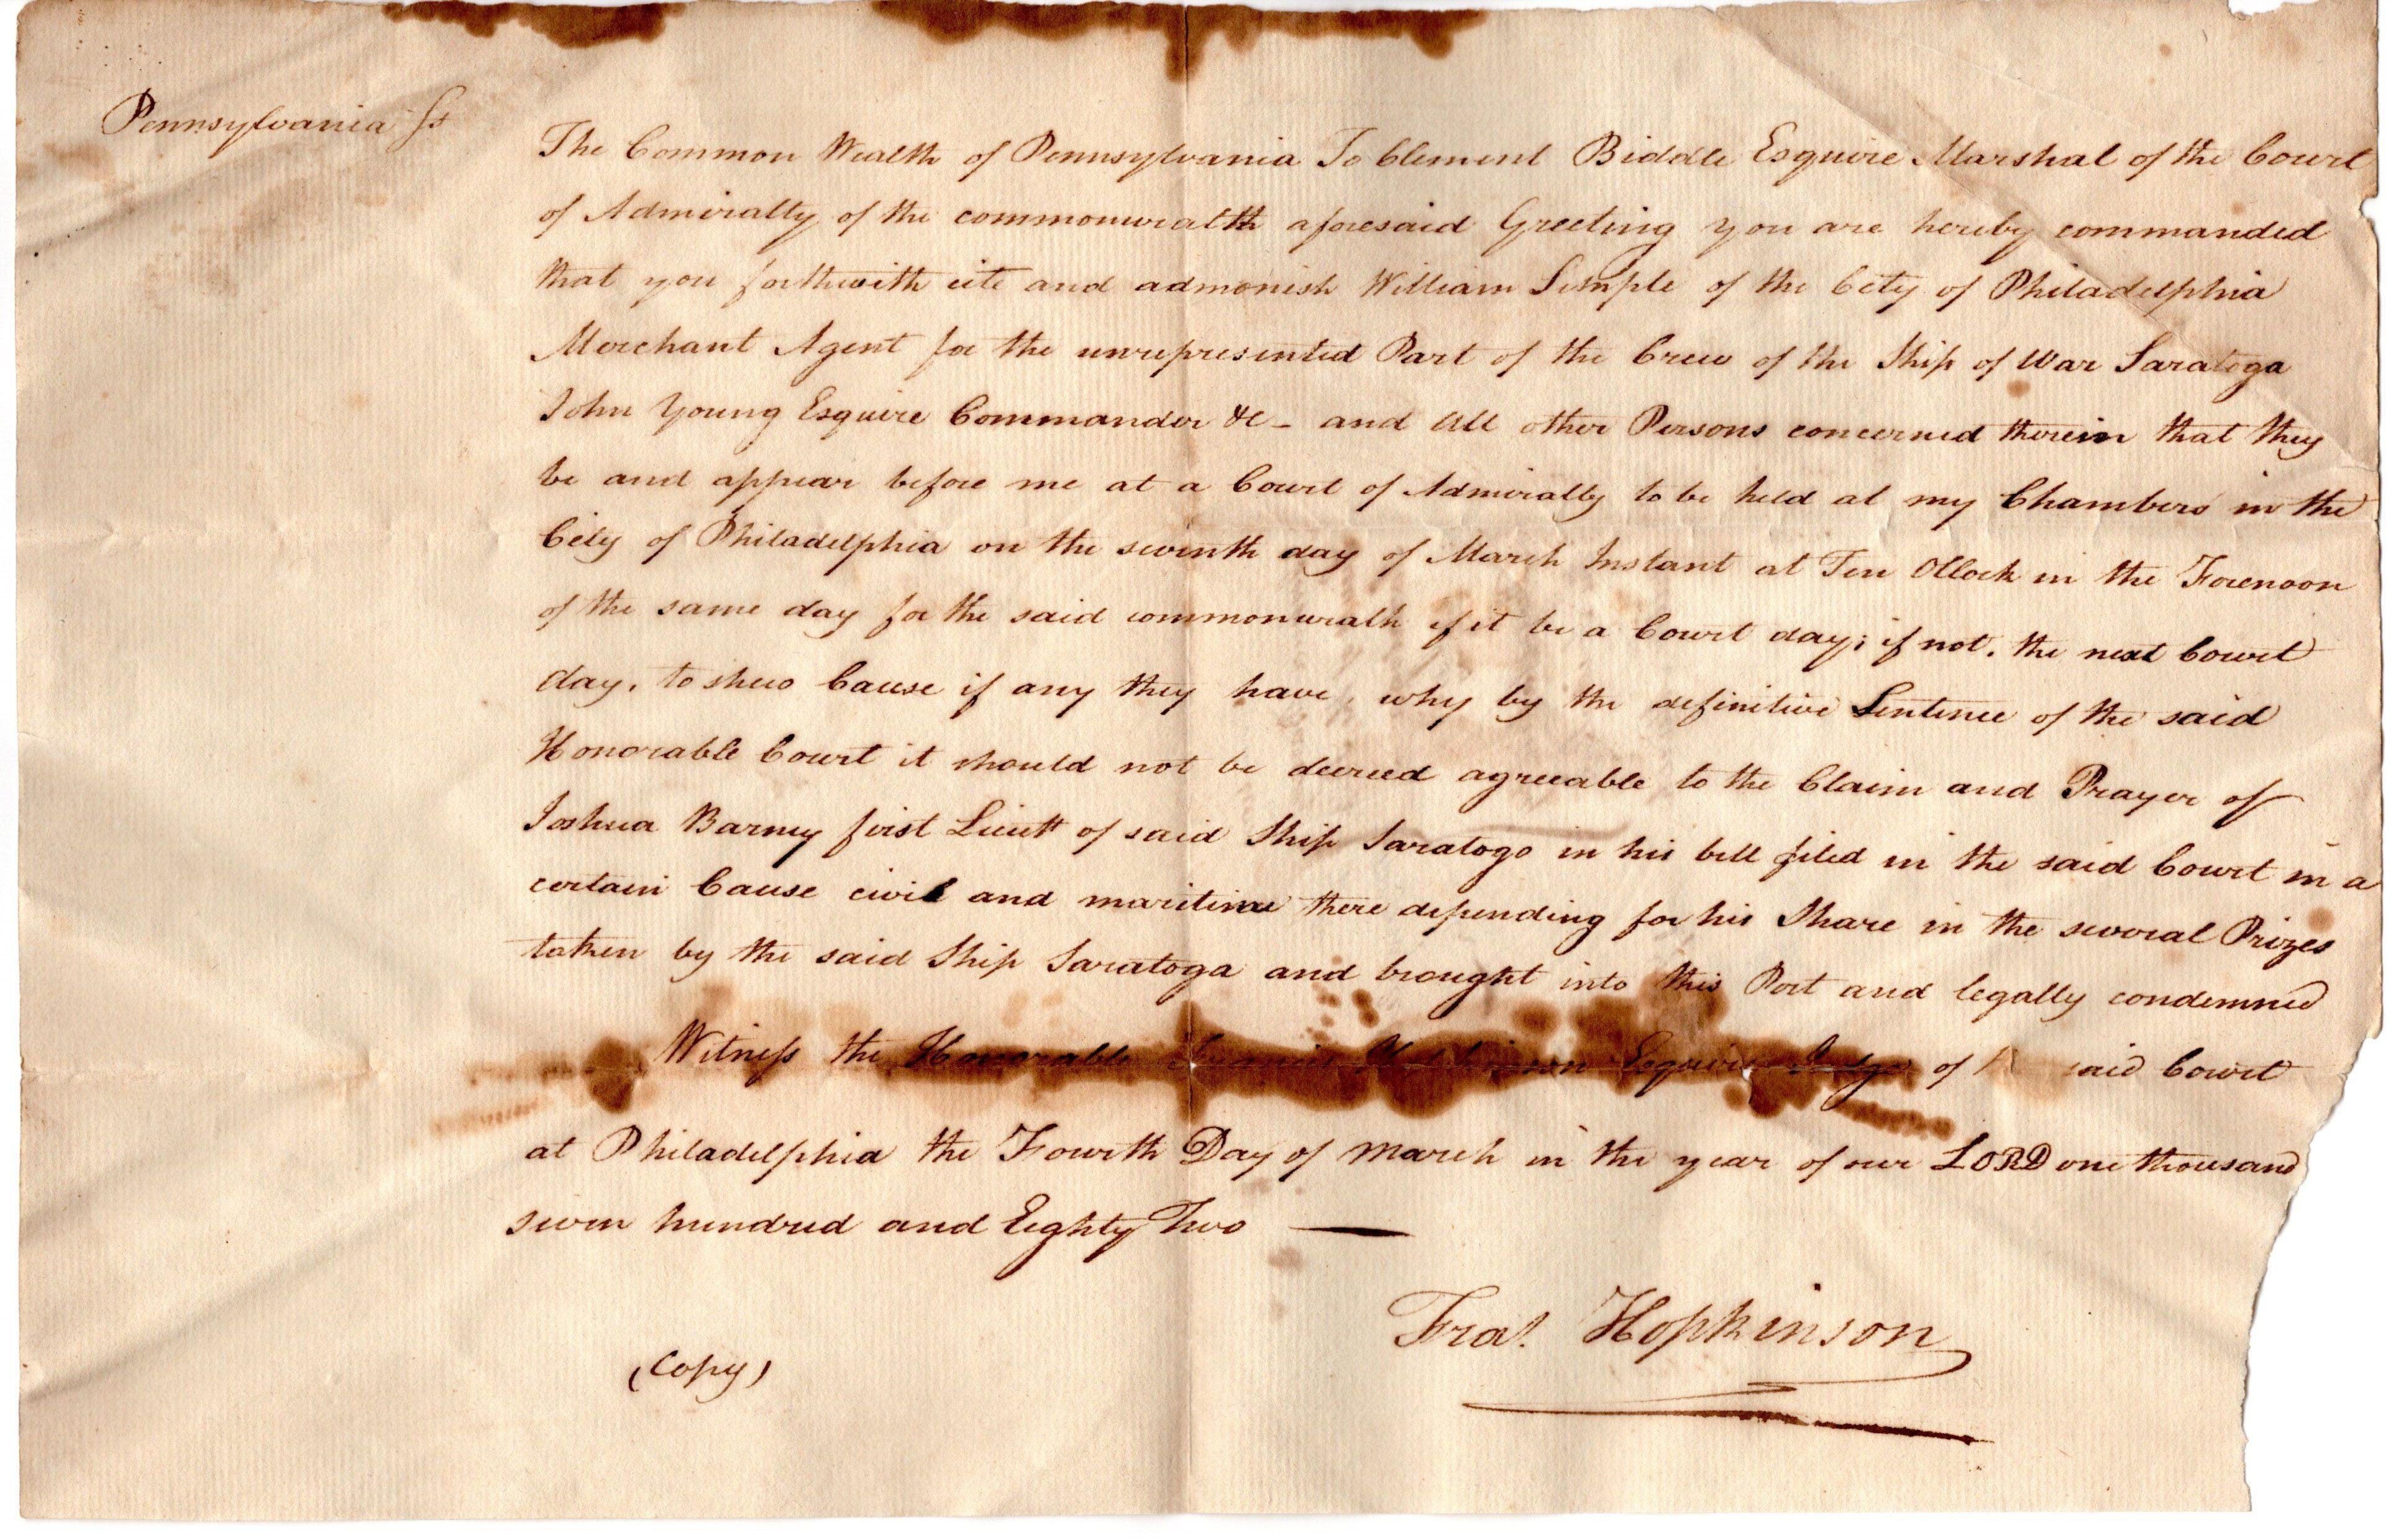 Francis Hopkinson Declaration-Signer and U.S. Flag Designer Orders Attendance for Case Filed by Revolutionary War Naval Hero Joshua Barney